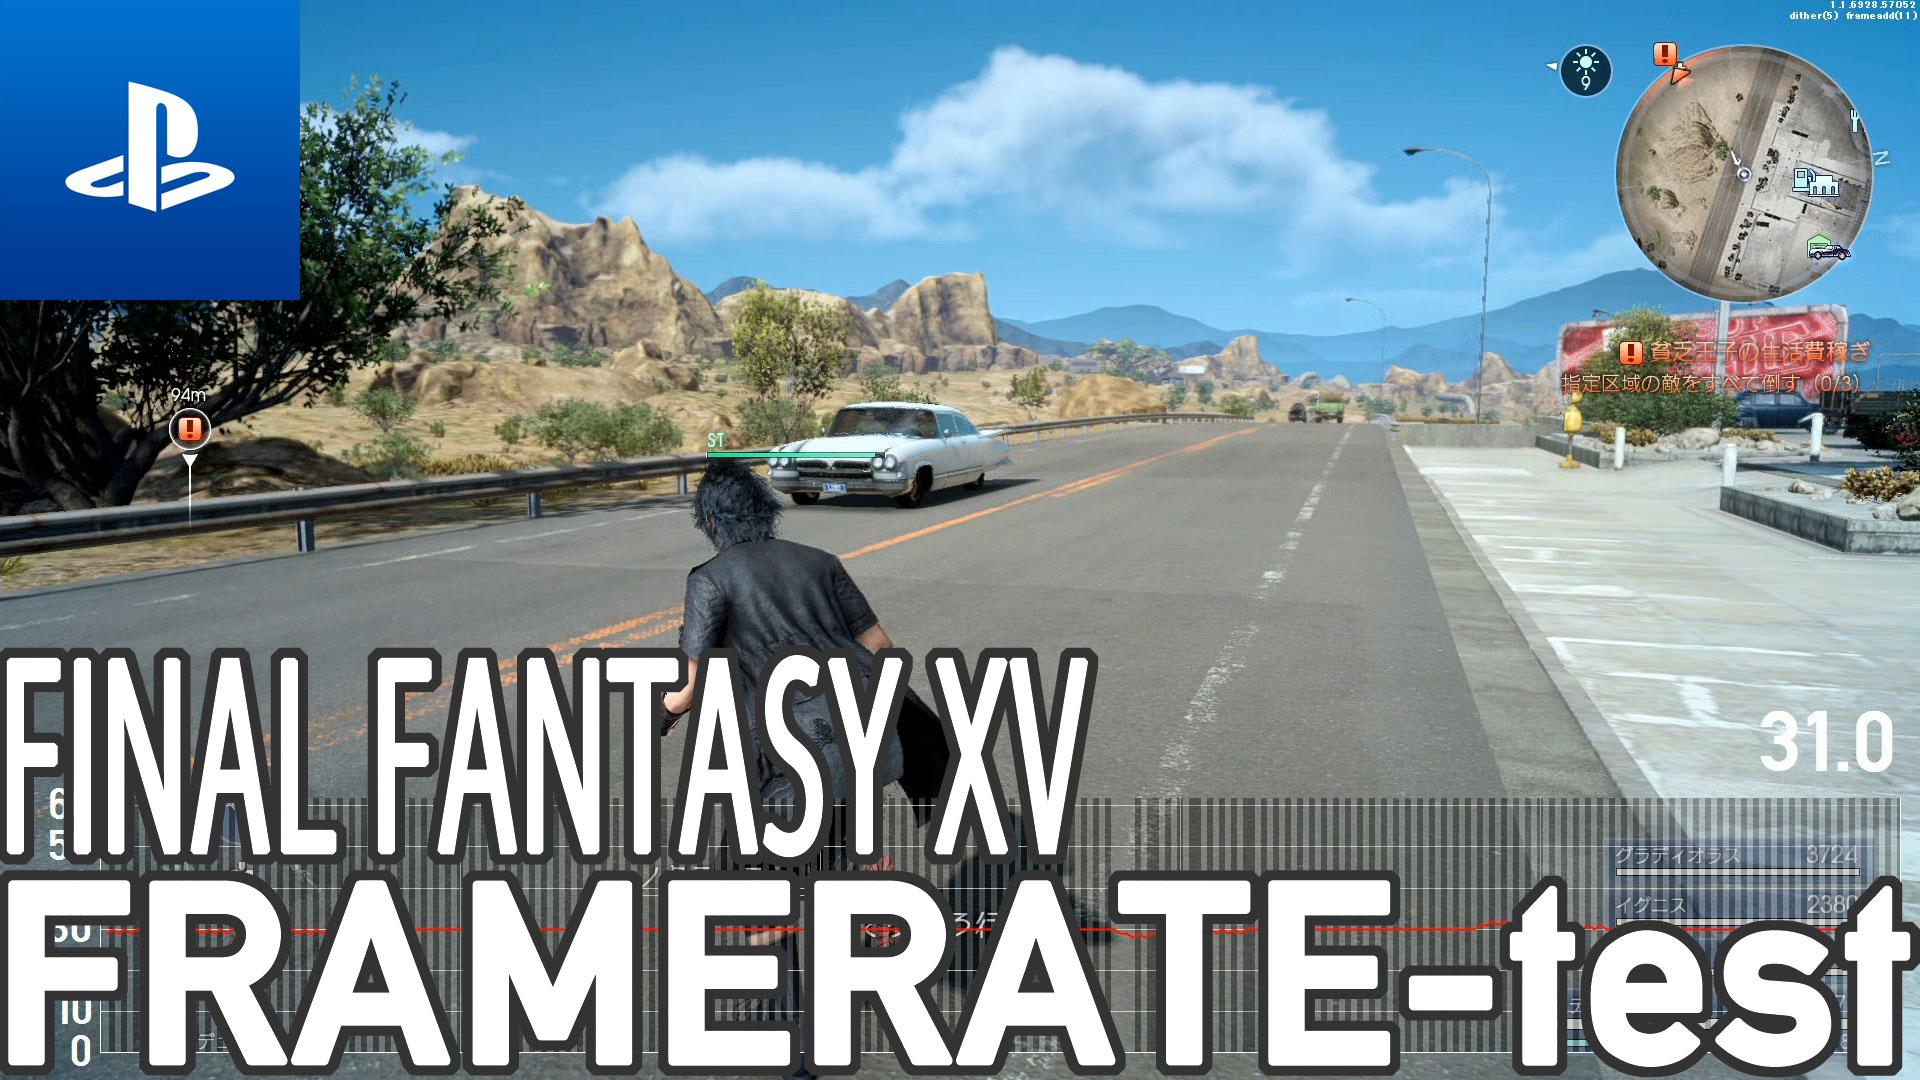 FINAL FANTASY XV フレームレート検証